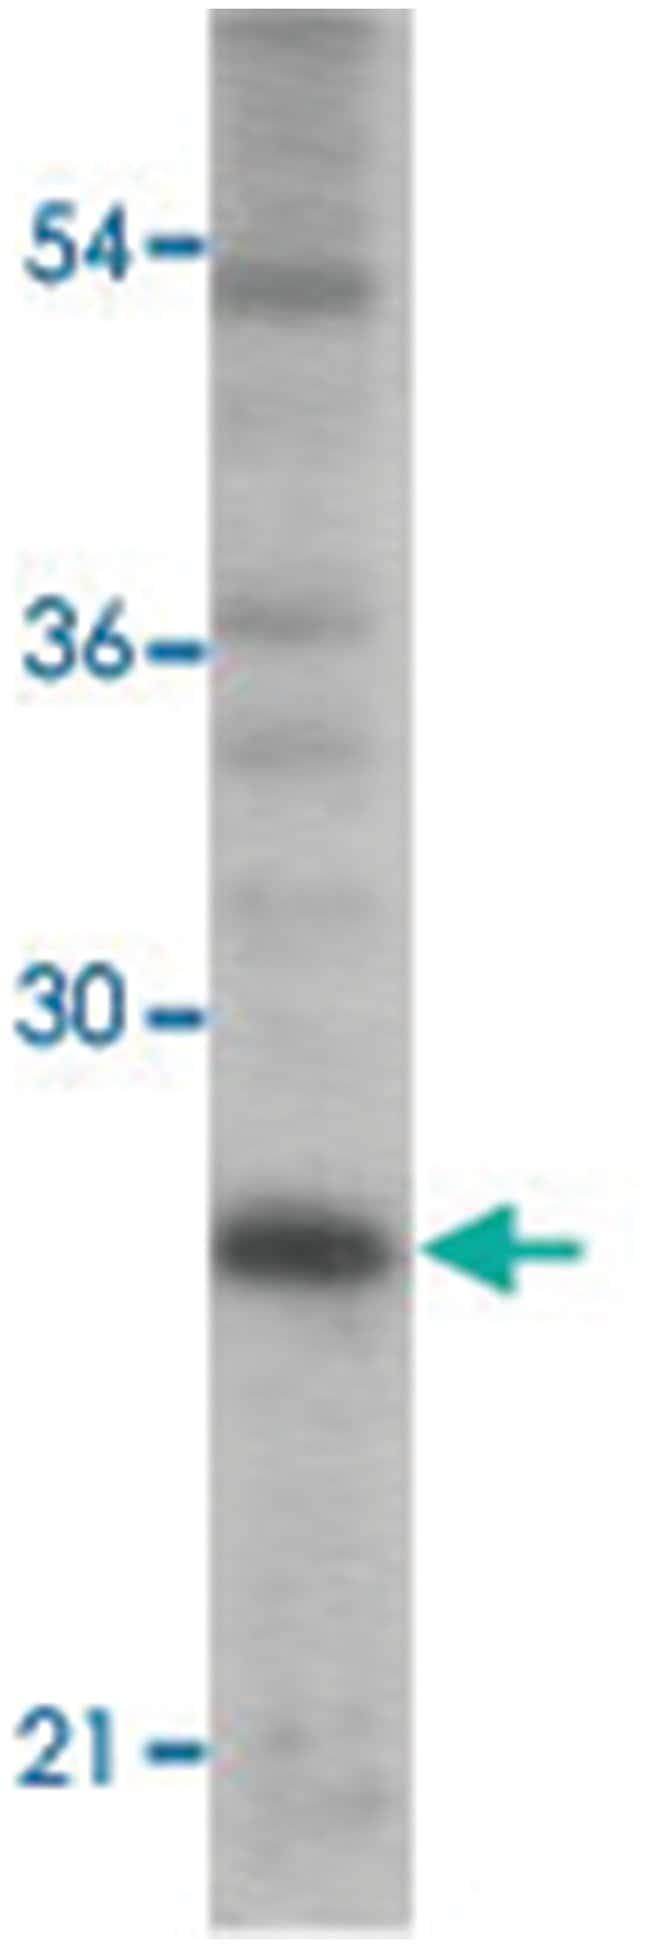 TICAM2 Rabbit anti-Human, Polyclonal Antibody, Abnova 100µg; Unlabeled:Life